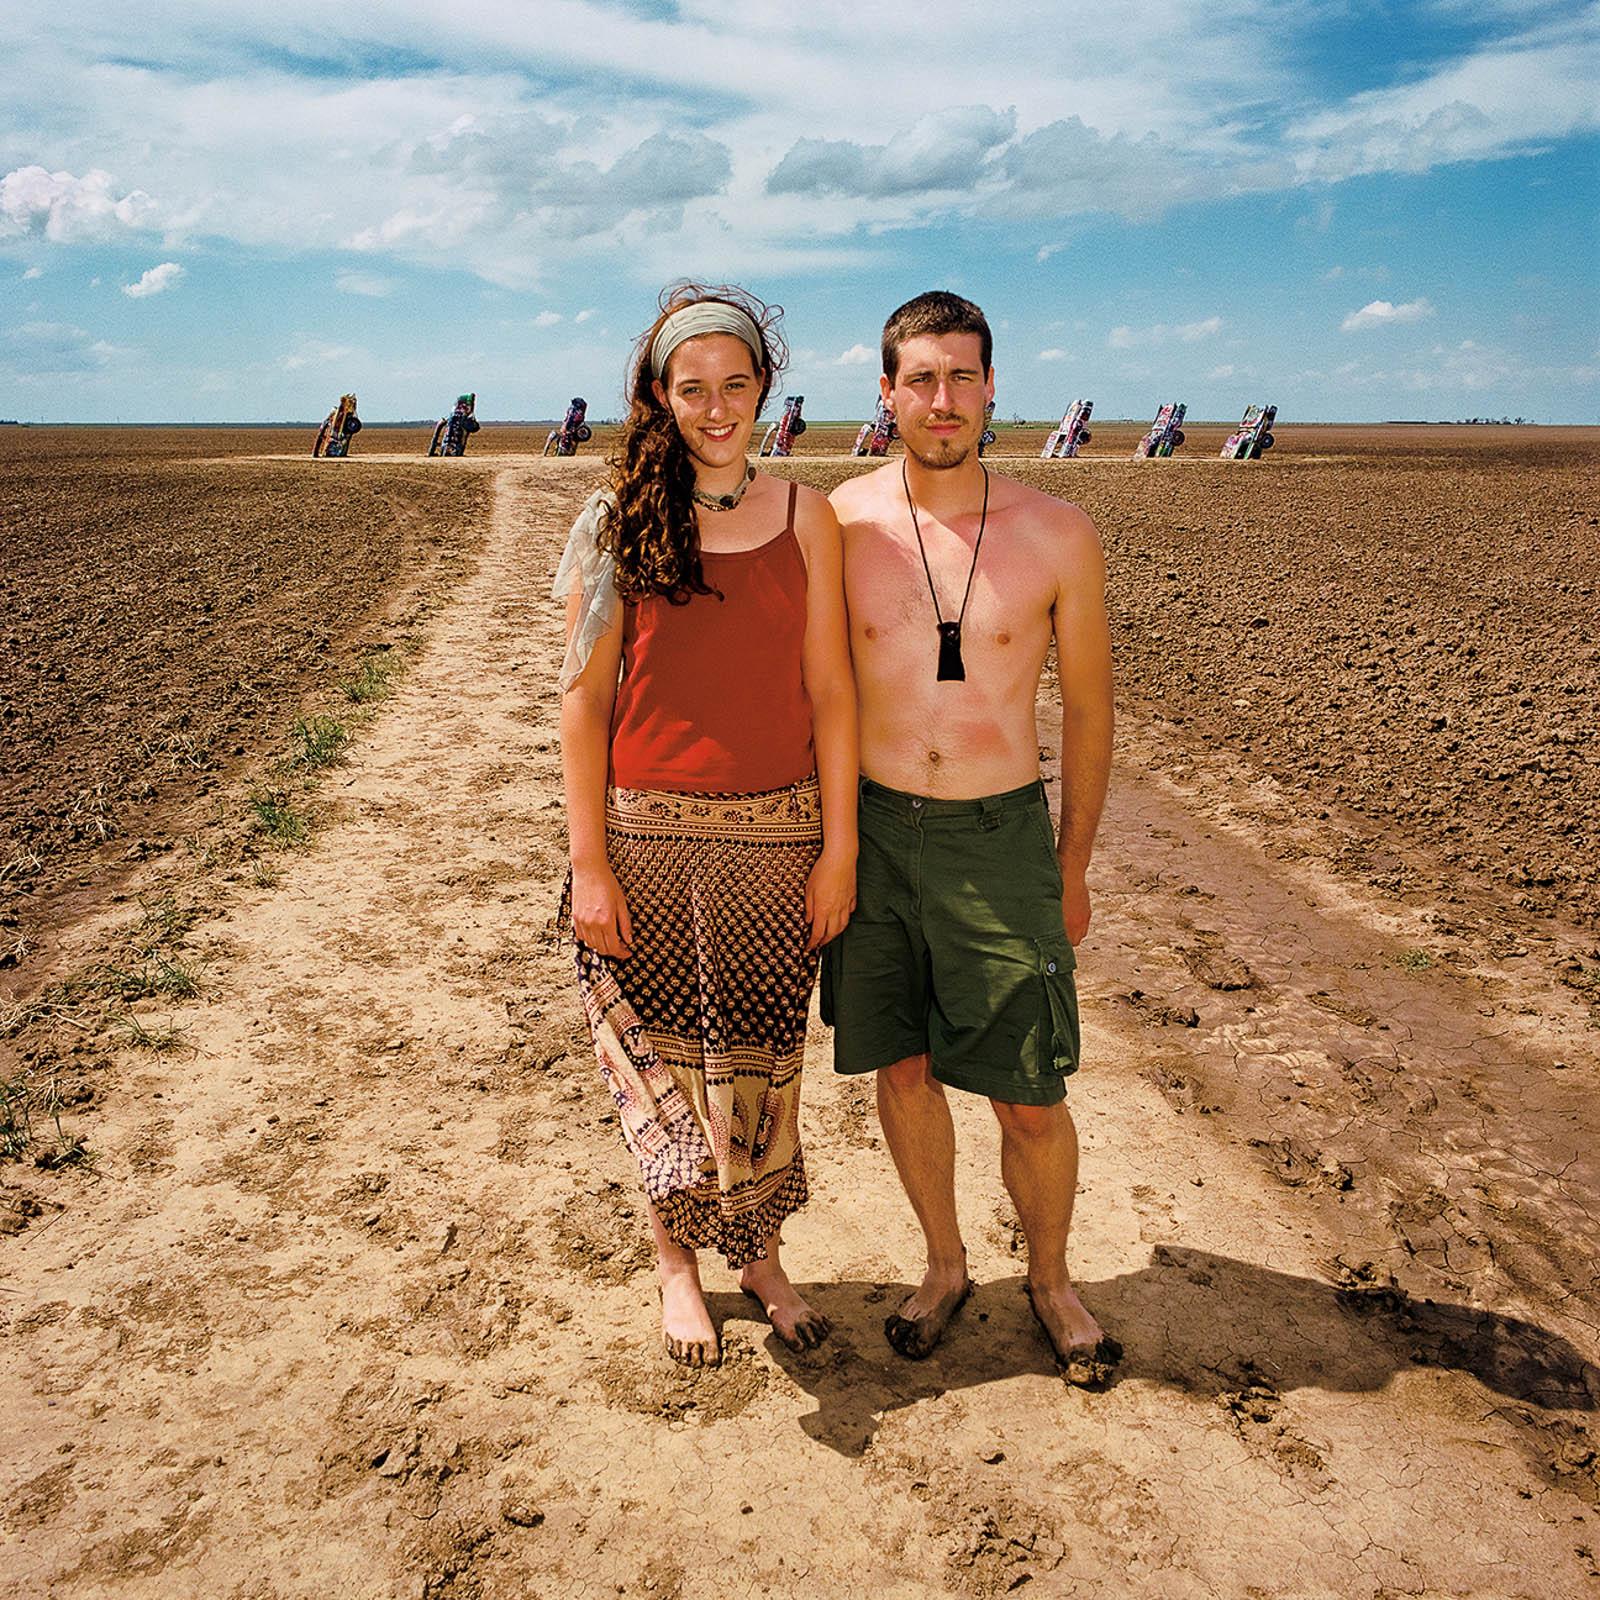 Couple at Cadillac Ranch, Amarillo, Texas 1998